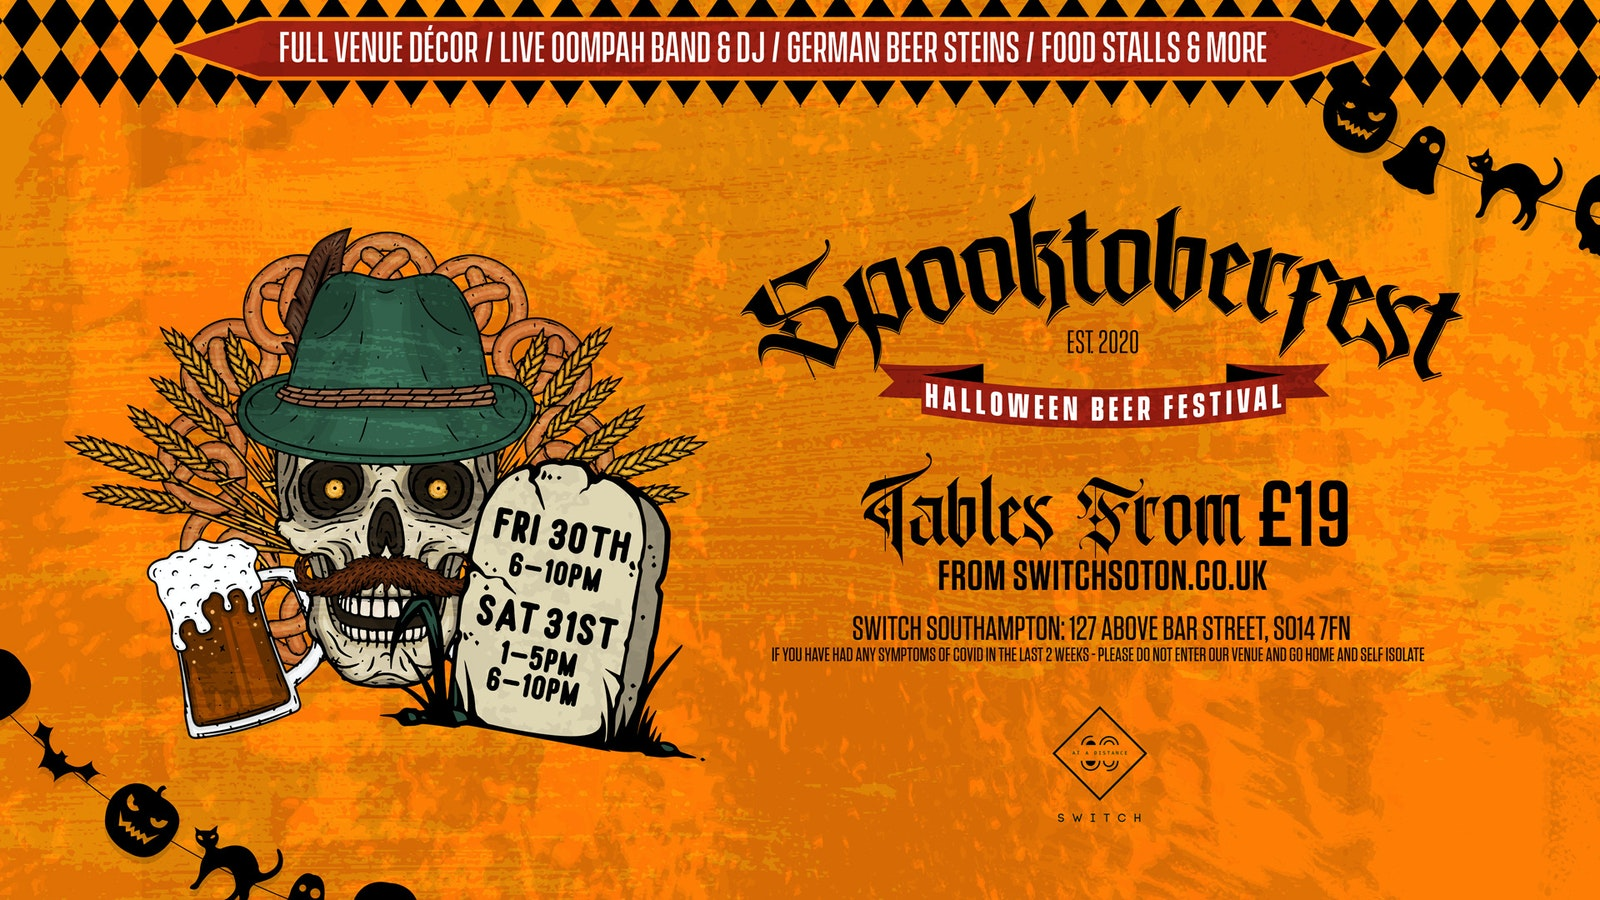 Spooktoberfest: Halloween Beer Festival (Friday Evening Session)